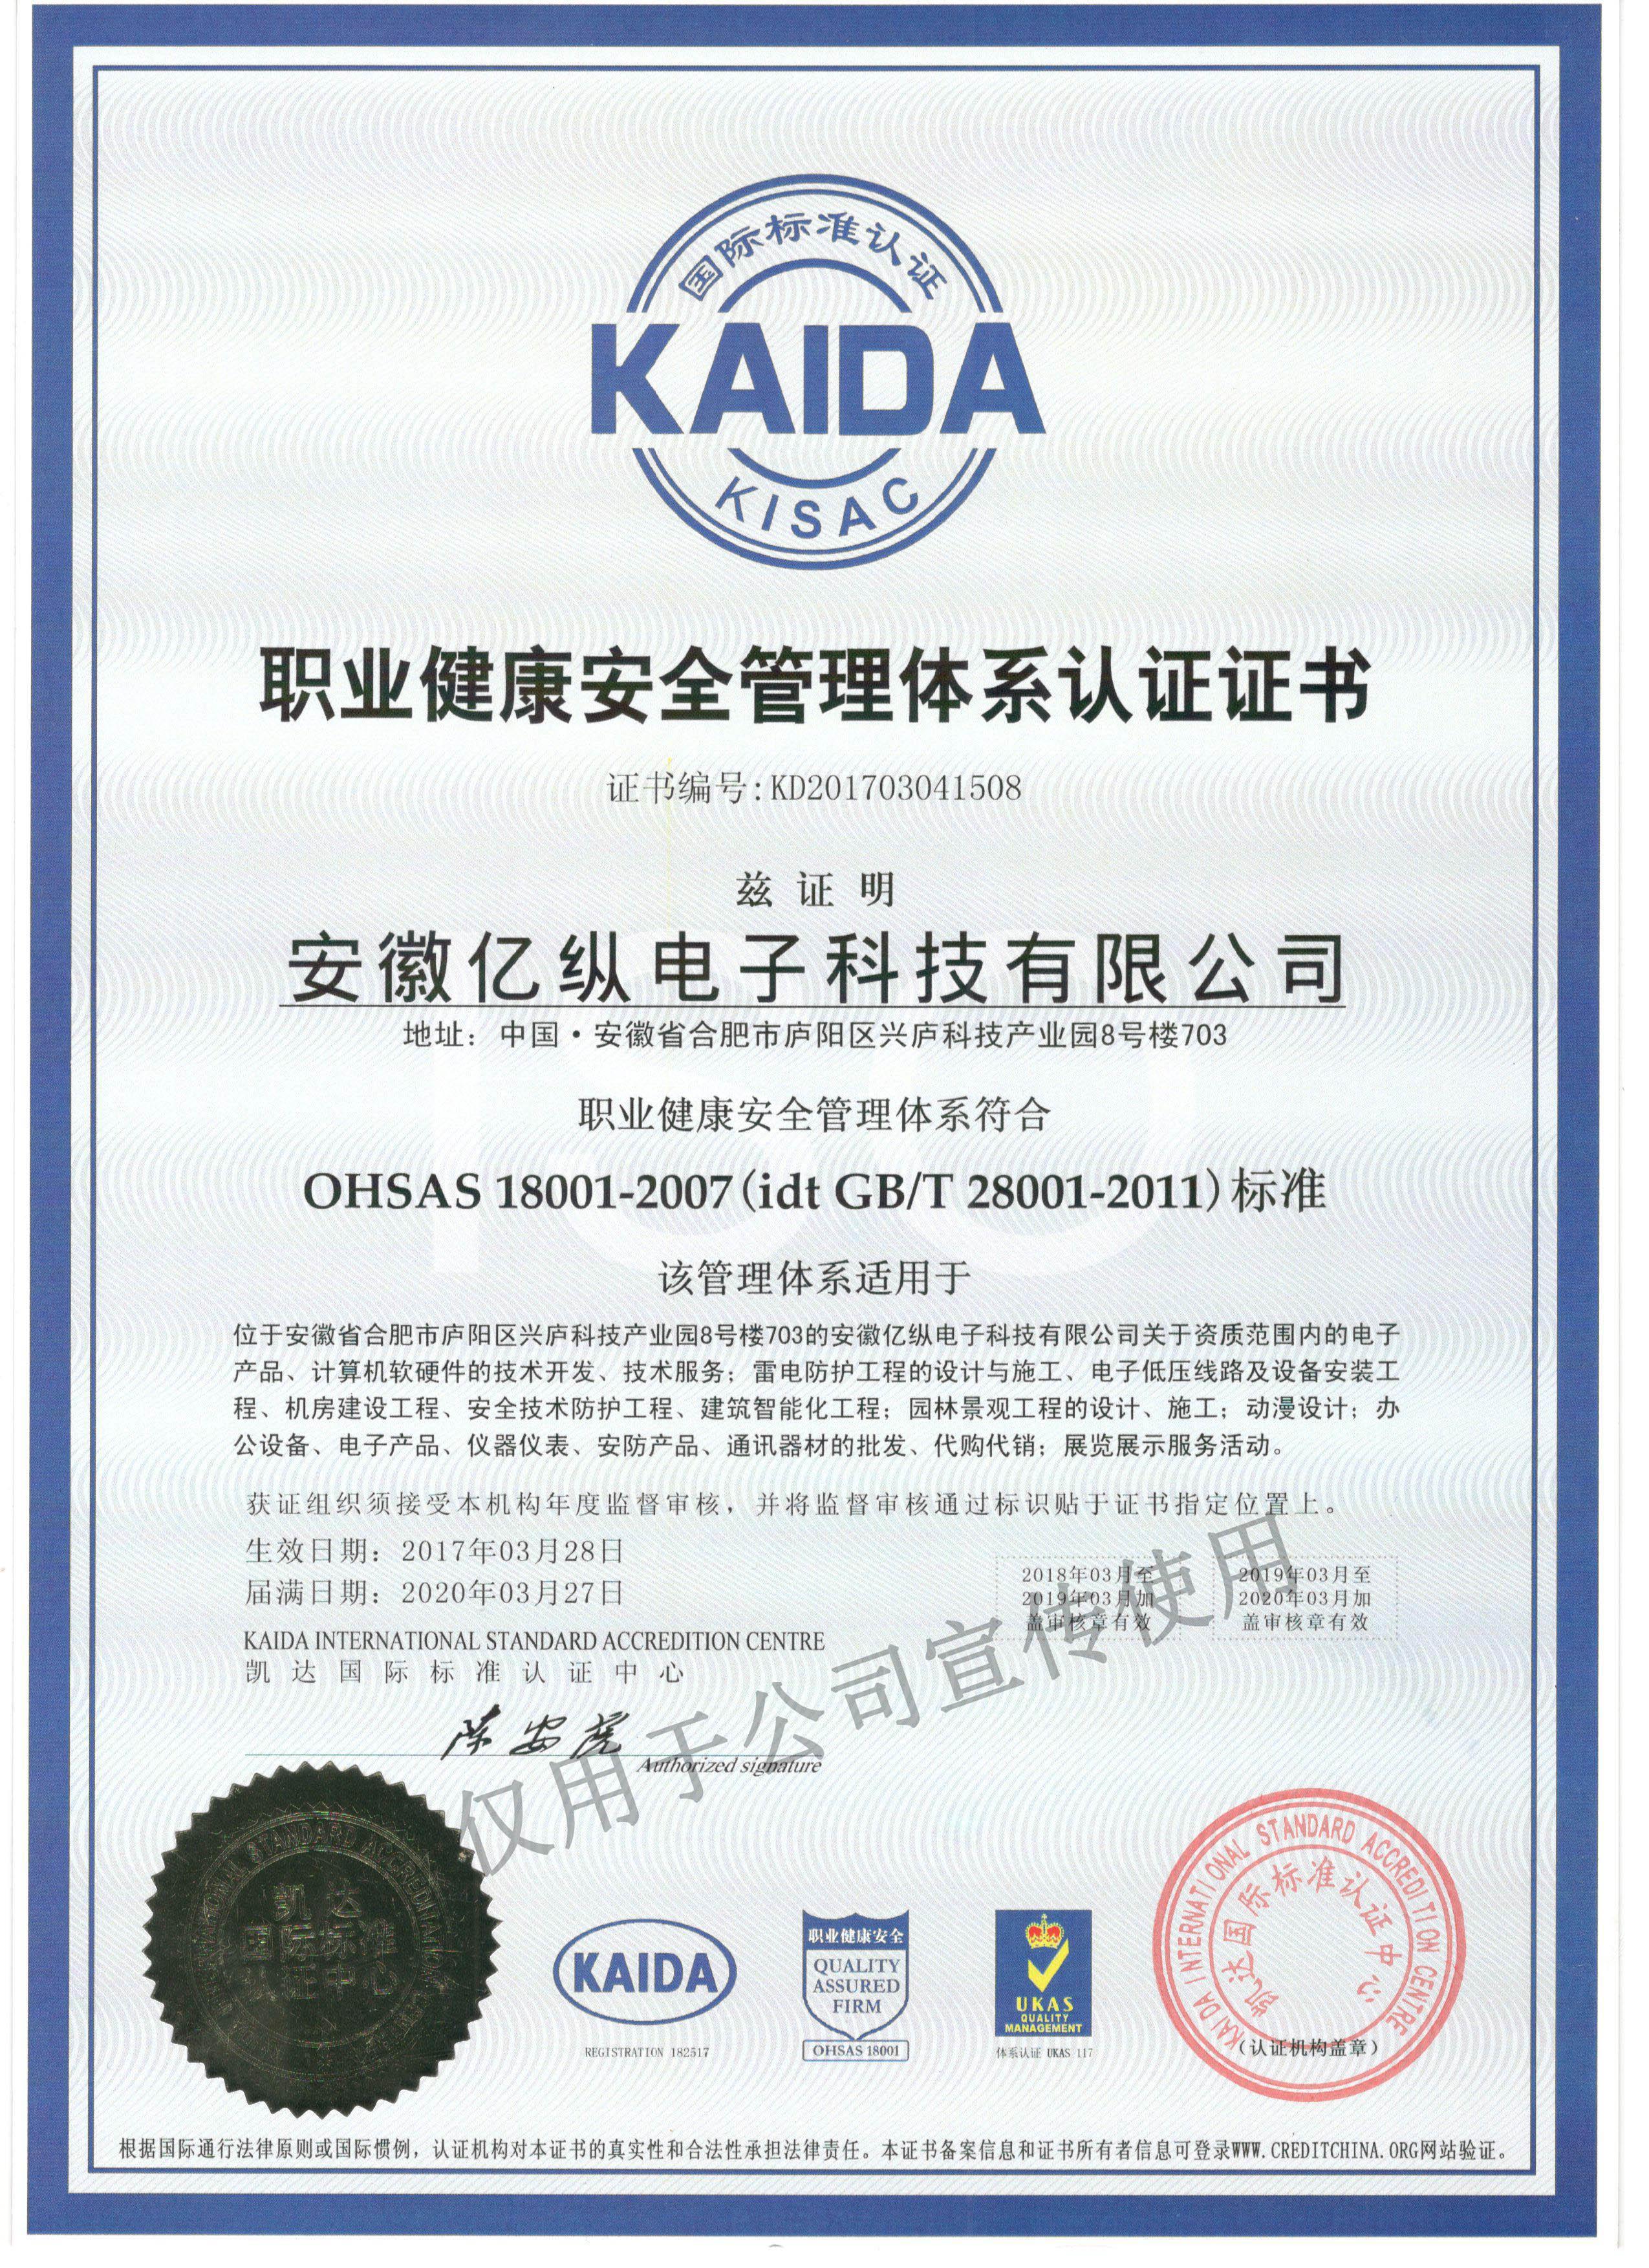 ISO三证1水印.jpg